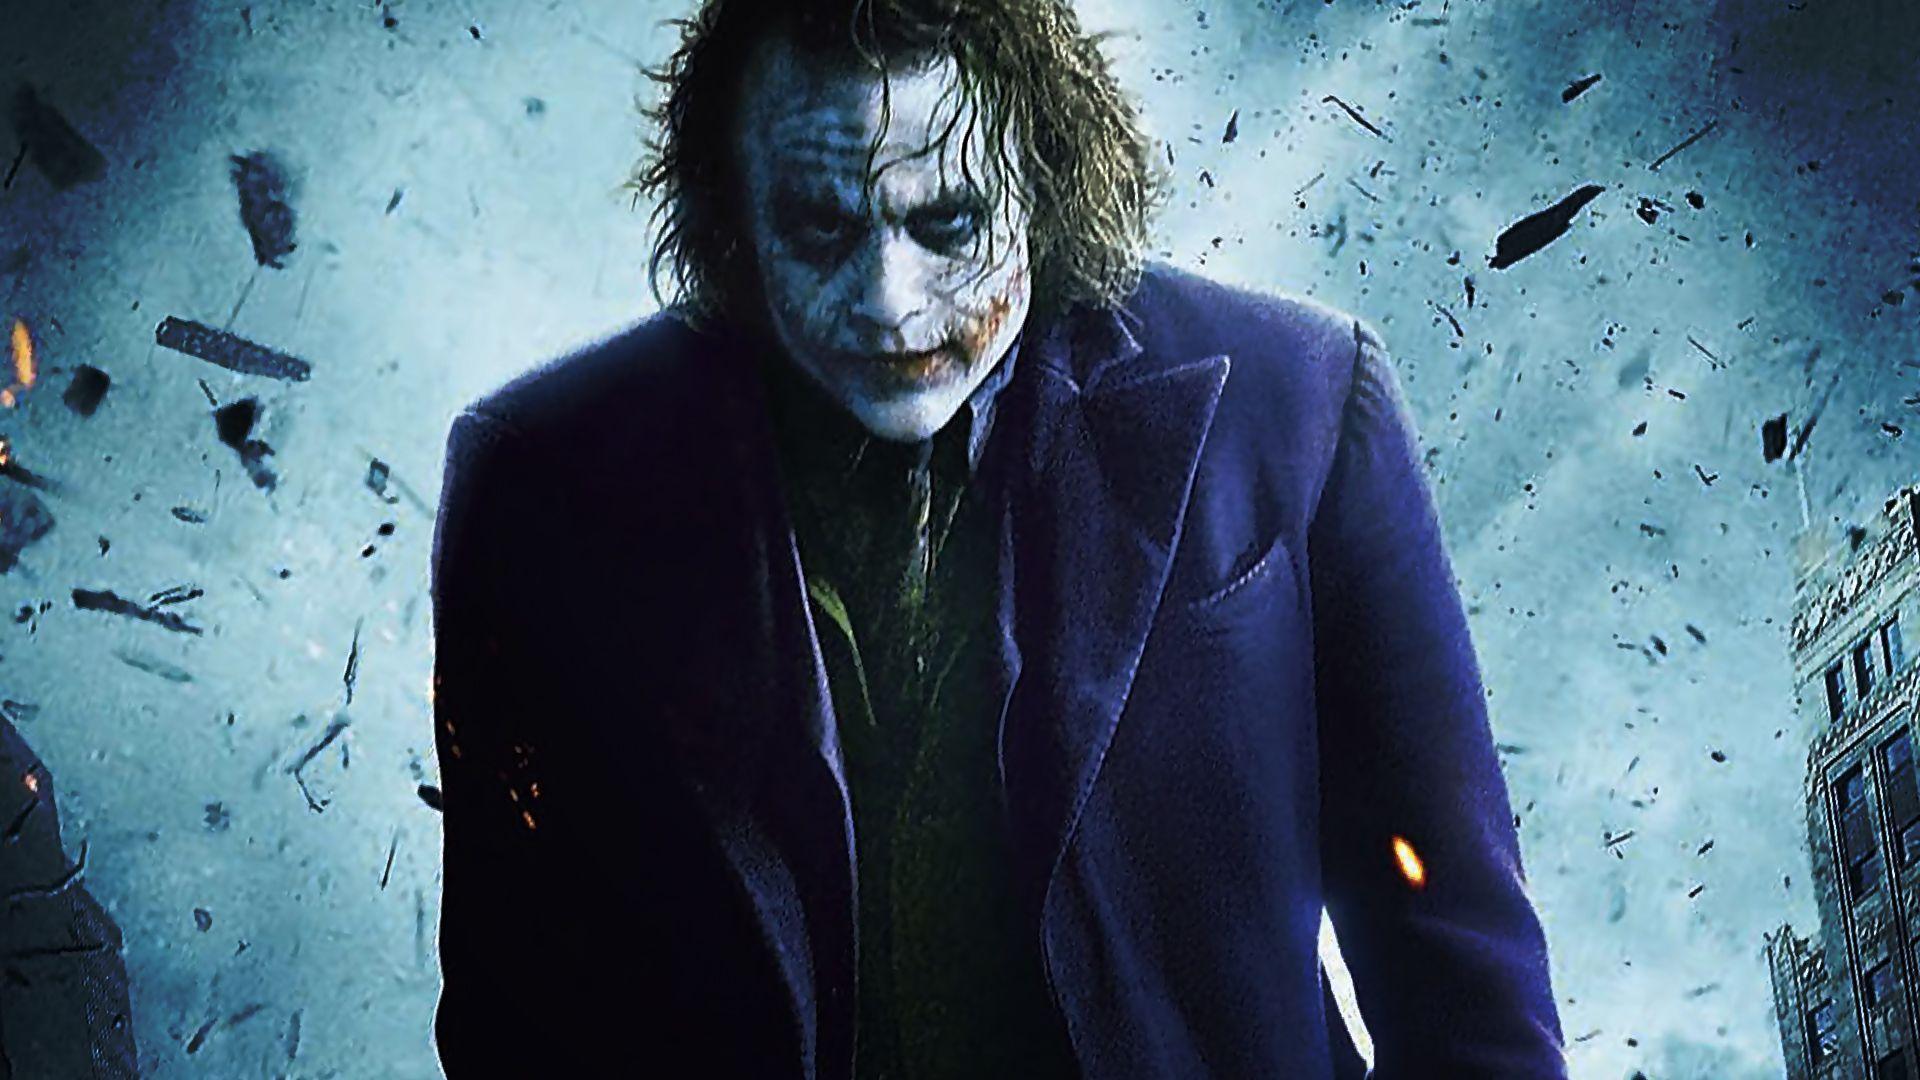 The Dark Knight Joker Wallpapers - Wallpaper Cave